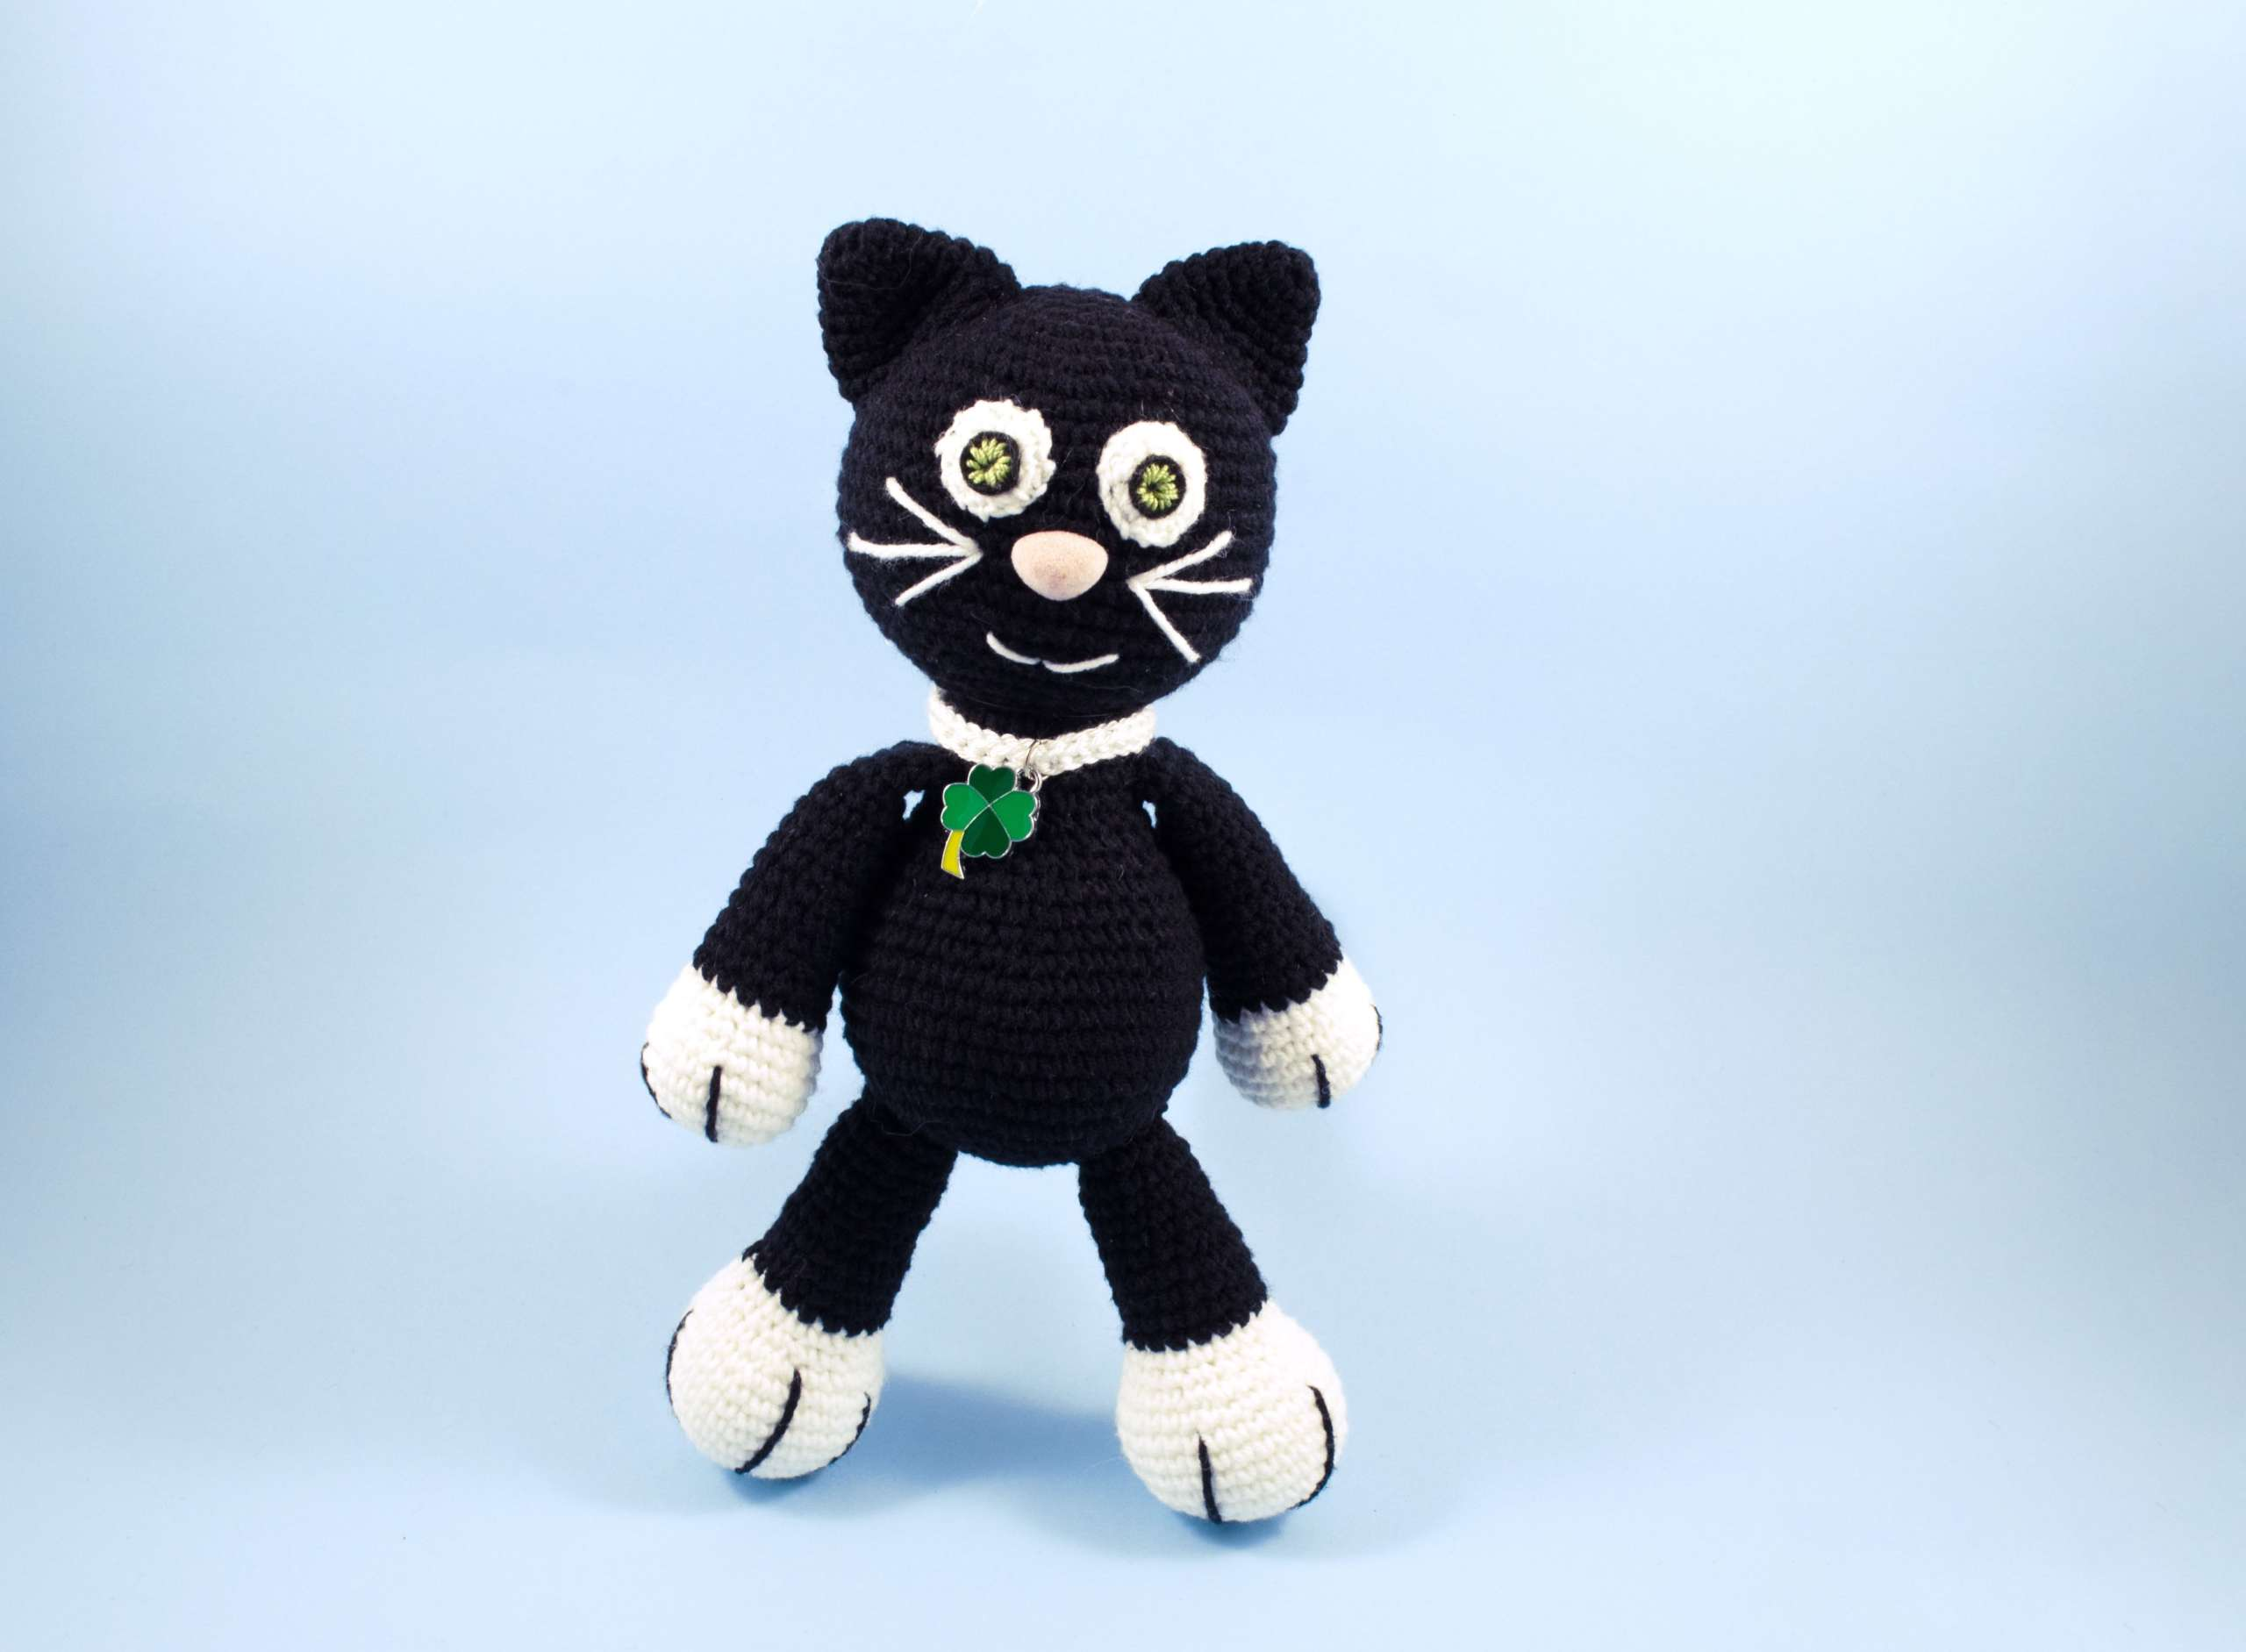 crochet black cat front view